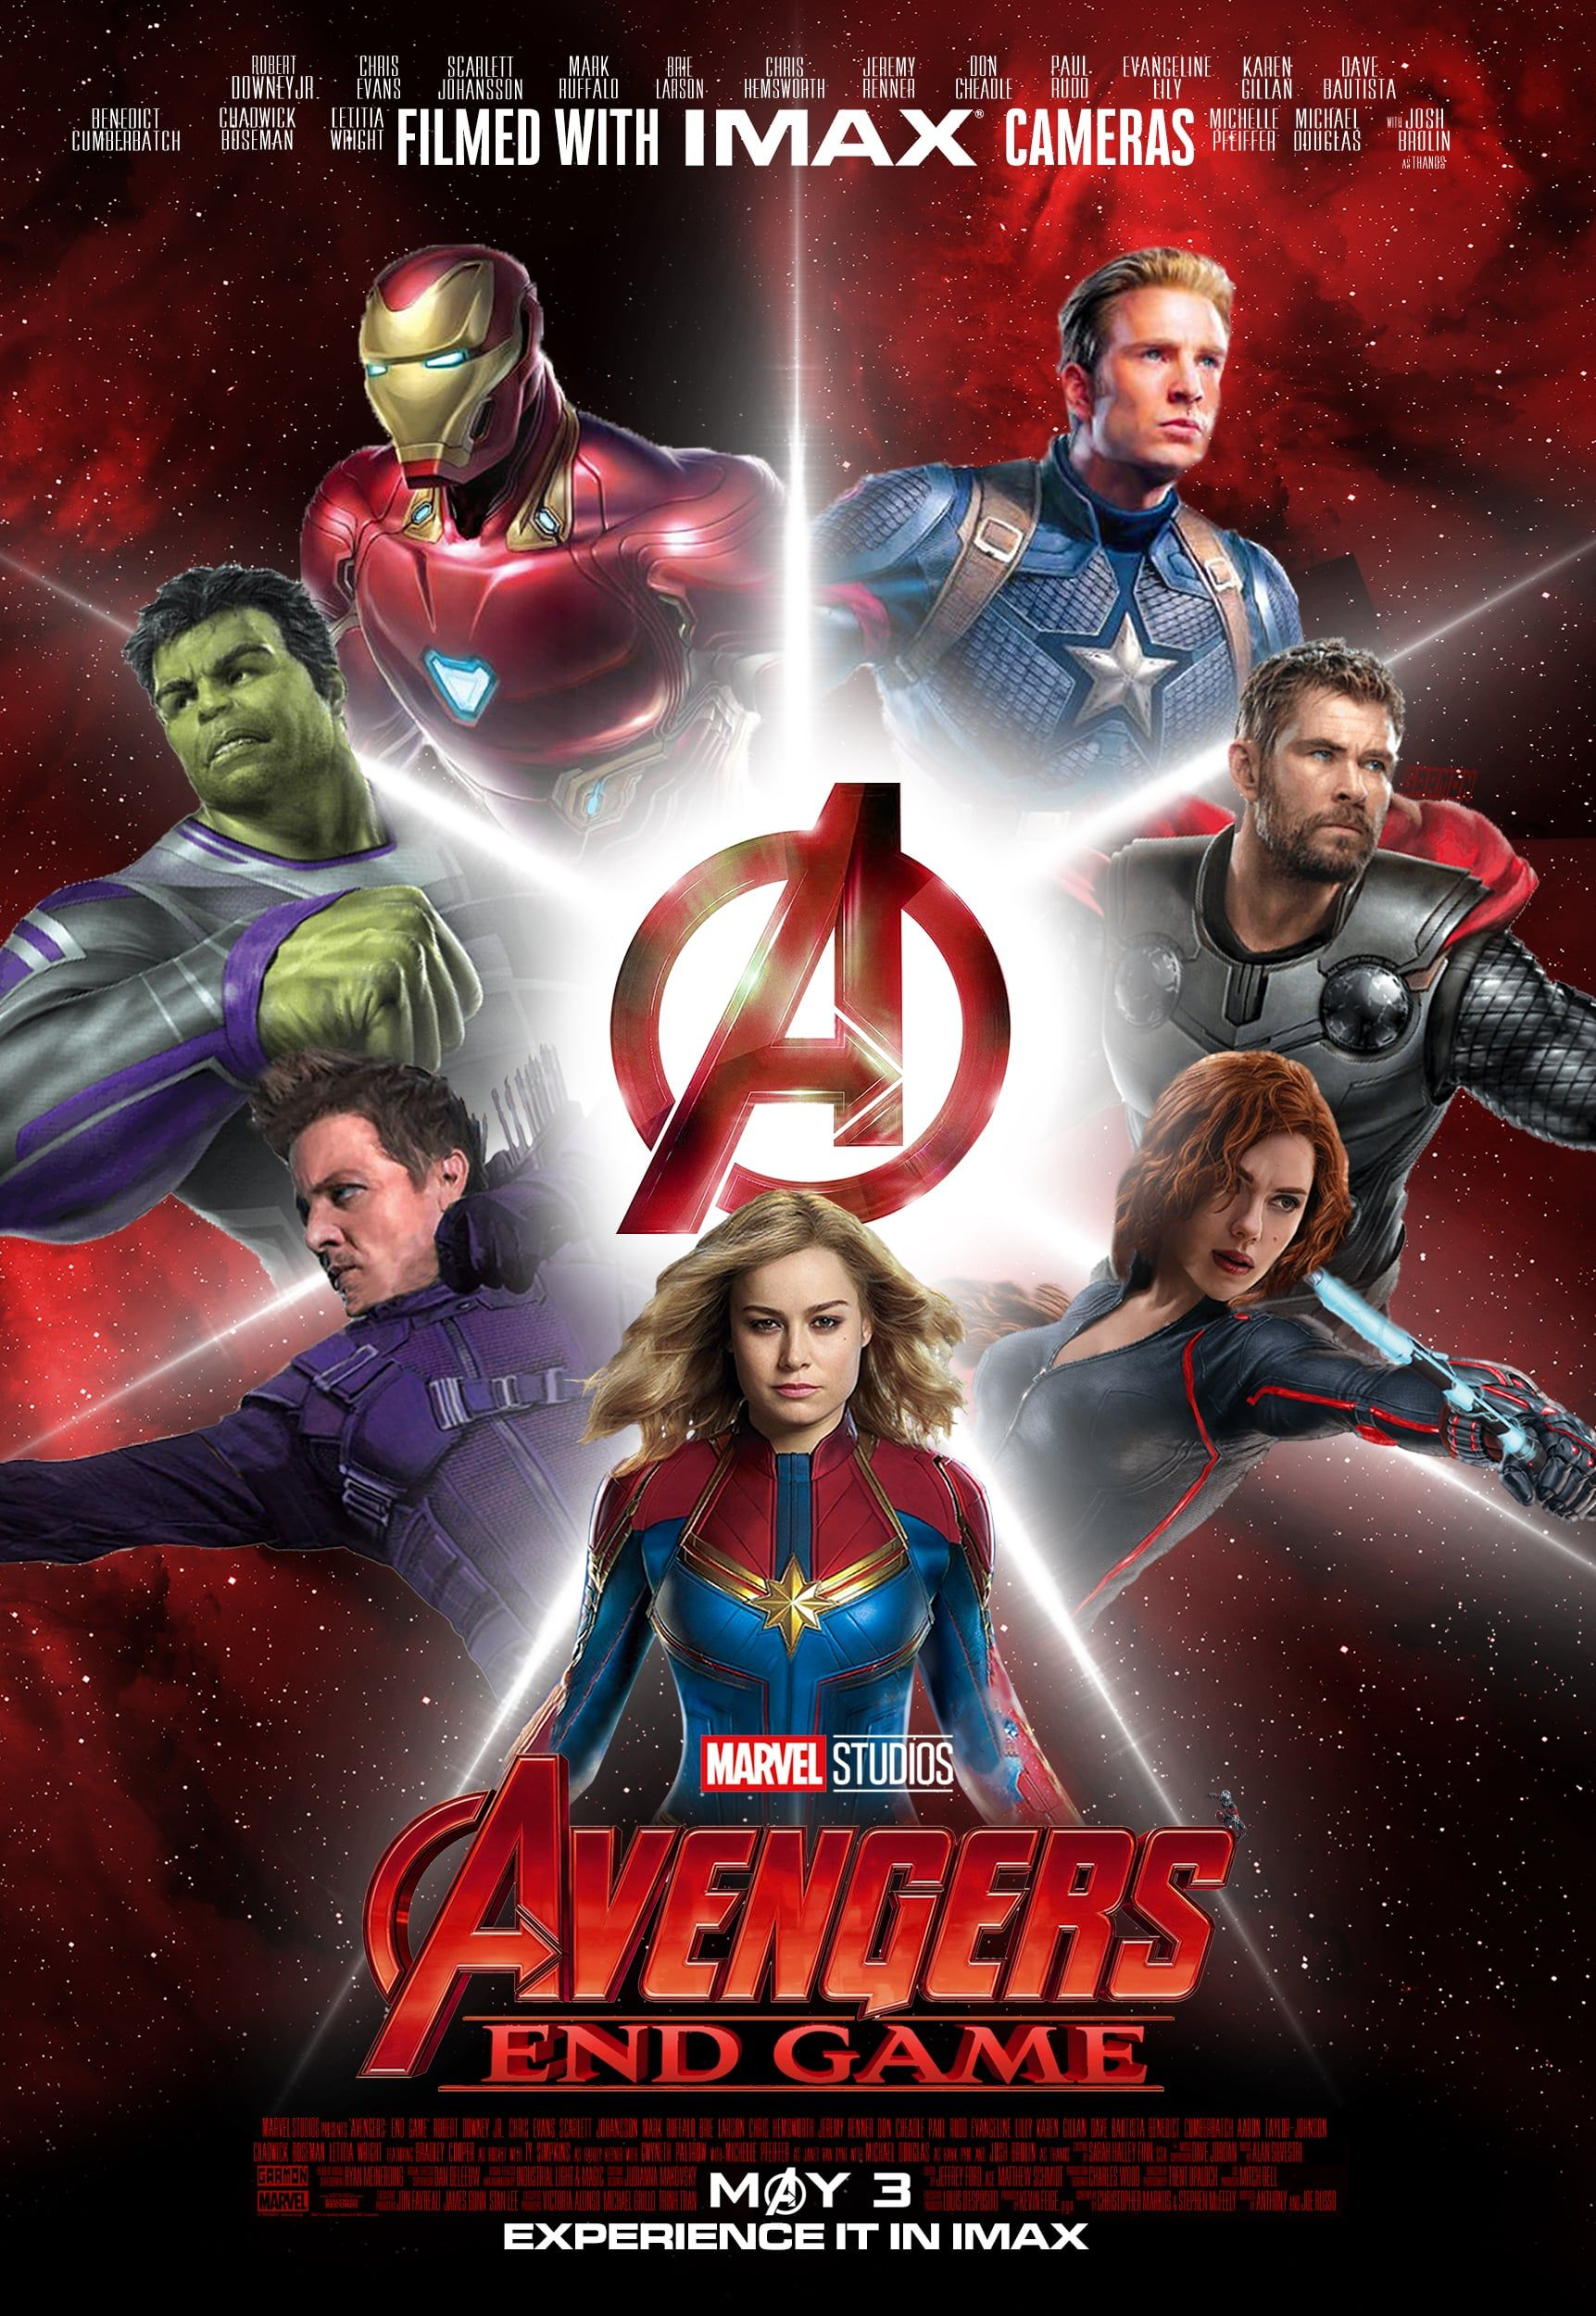 Avengers 4 Endgame Pelicula Completa Online En Espanol Latino Gratis Peliculas De Superheroes Memes De Los Vengadores Magnificos